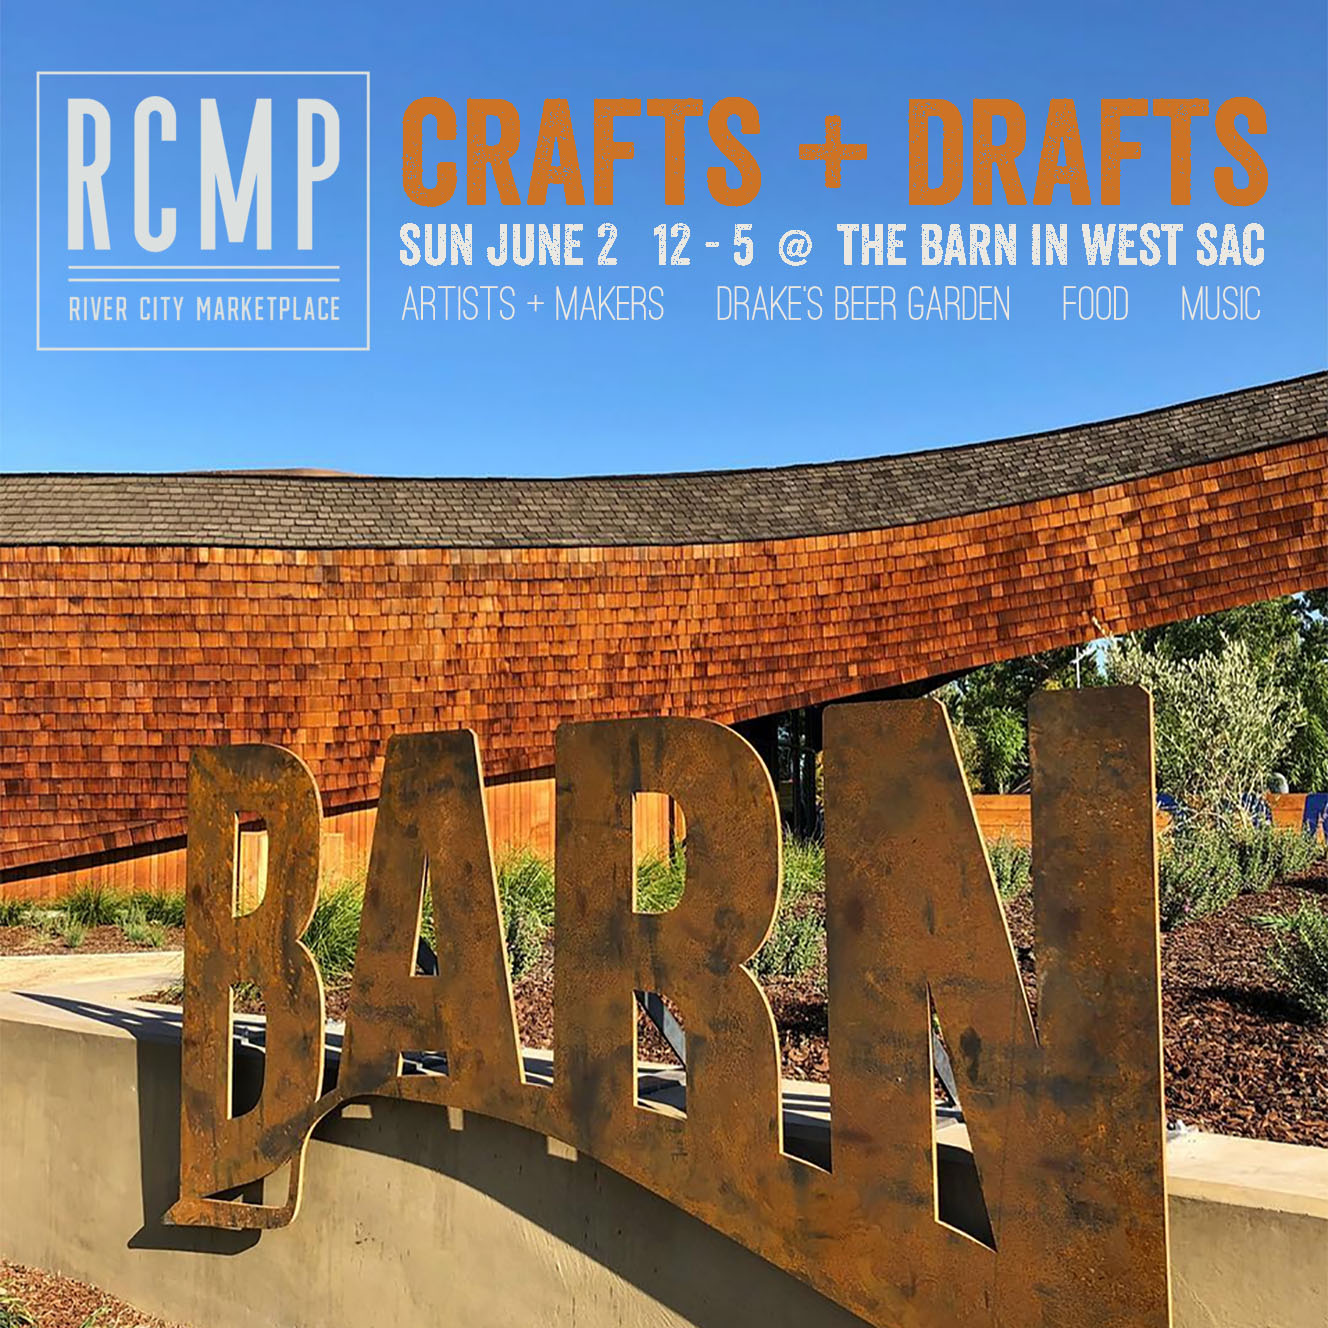 River City Marketplace: Crafts & Drafts